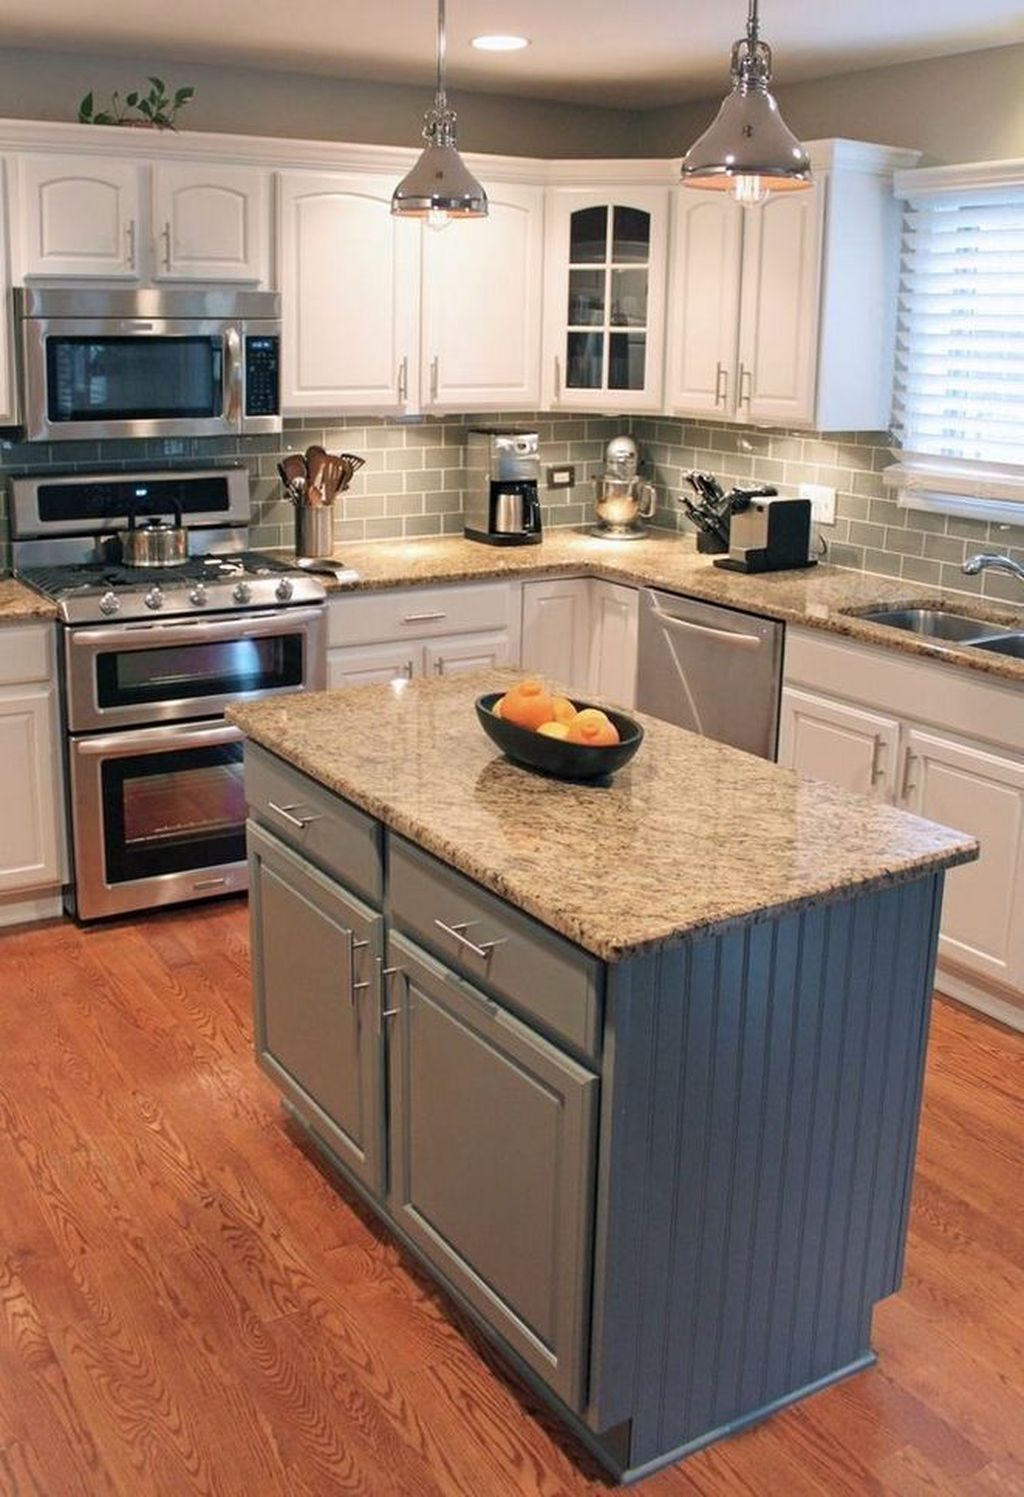 Brilliant Small Kitchen Remodel Design Ideas On A Budget 36